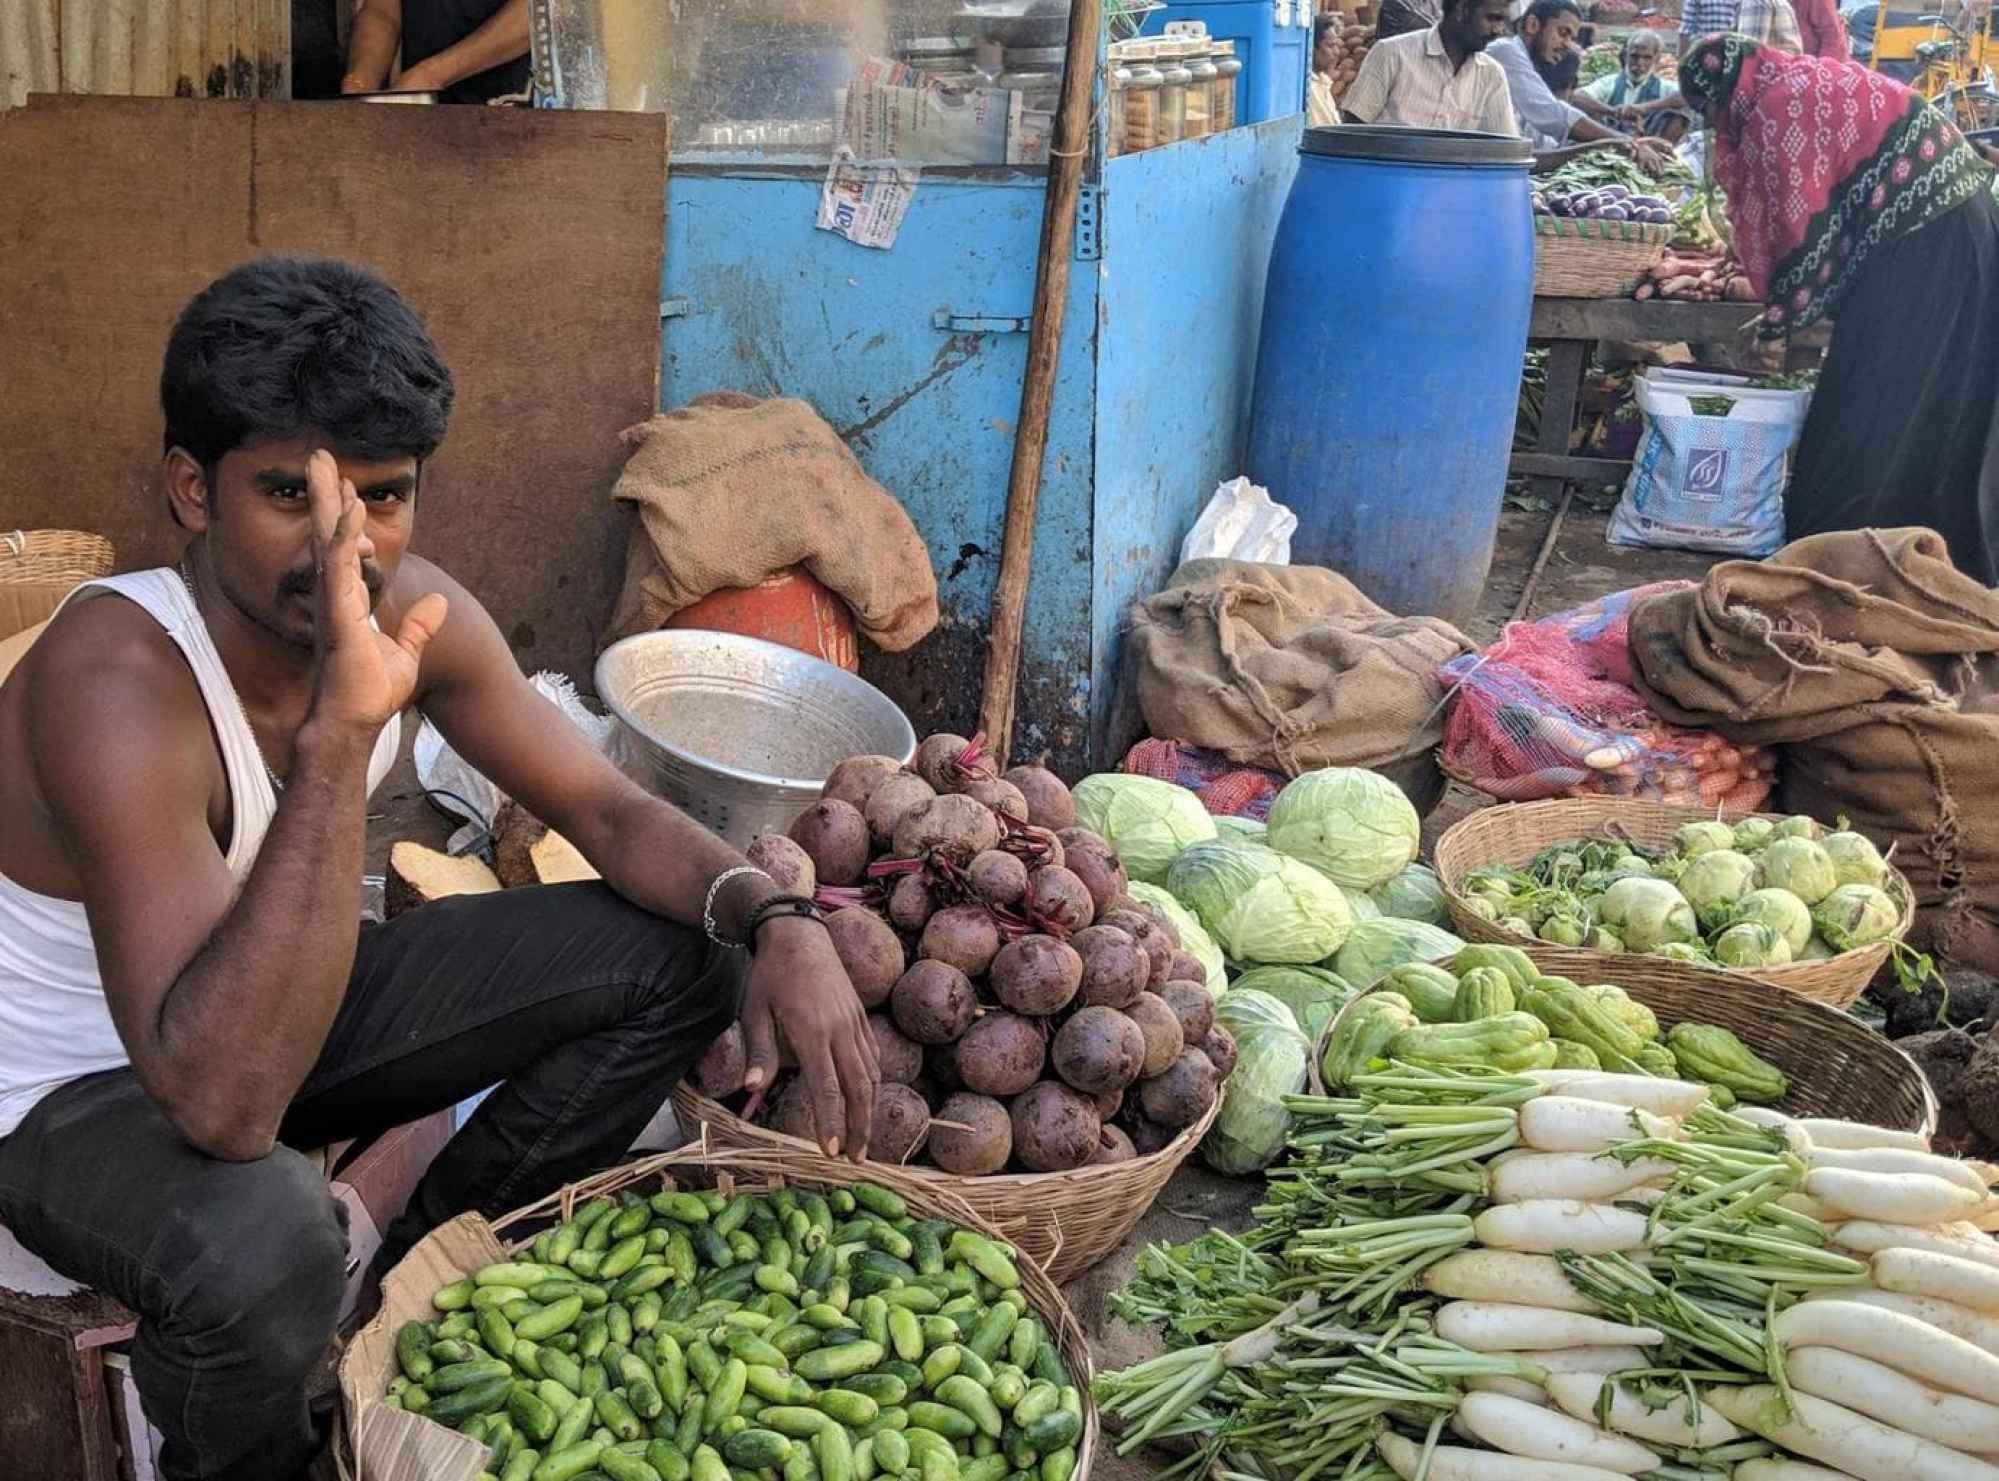 Georgetown market produce seller